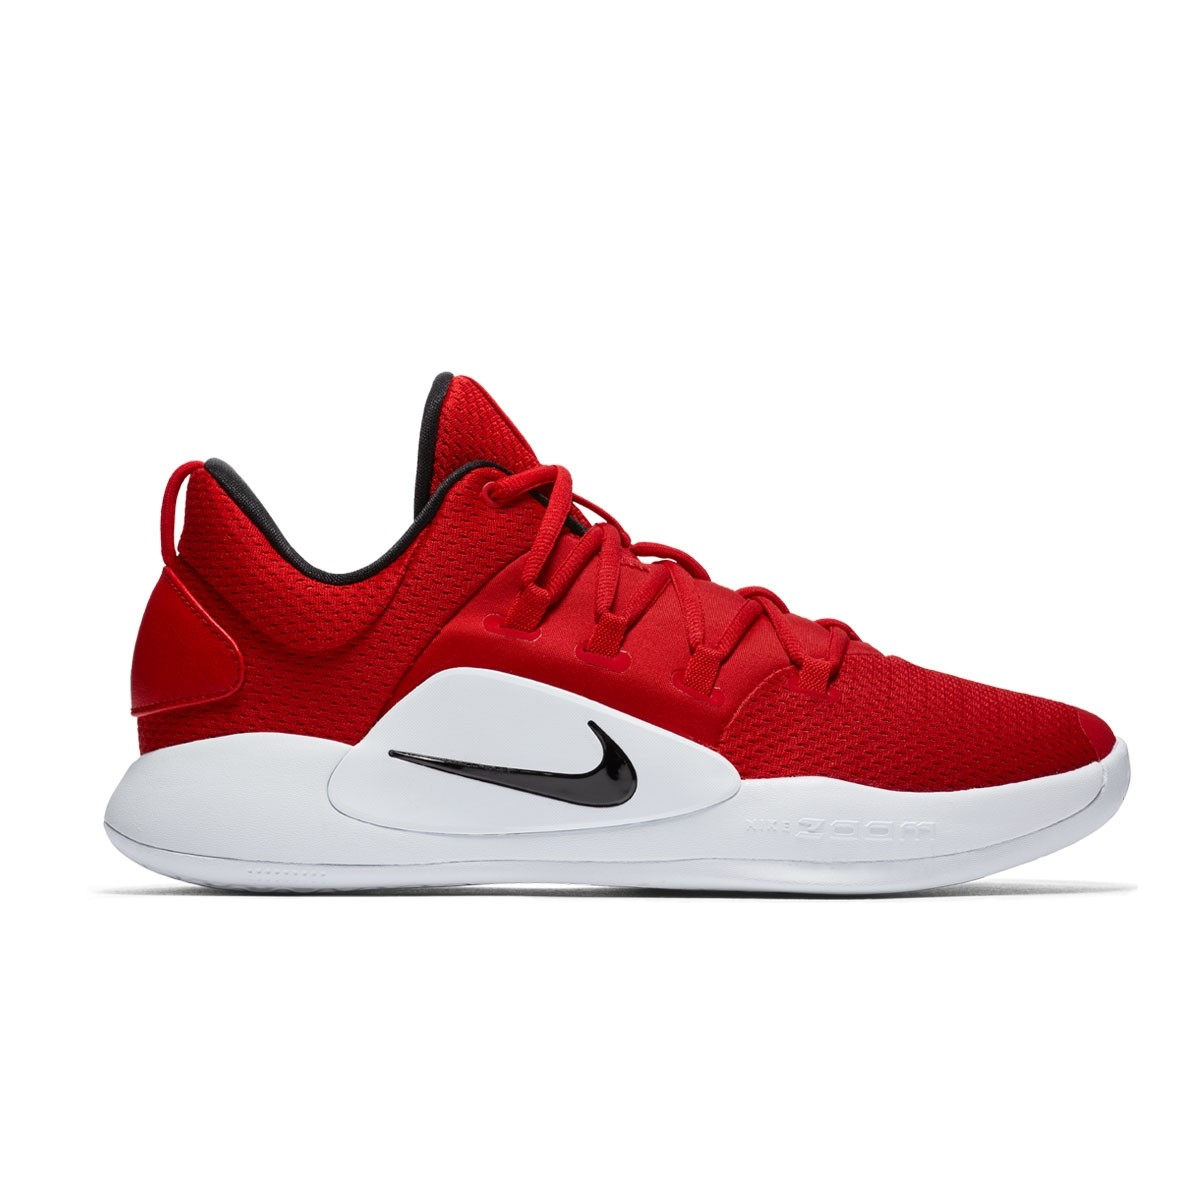 Nike Hyperdunk X Low 2018 'Red'